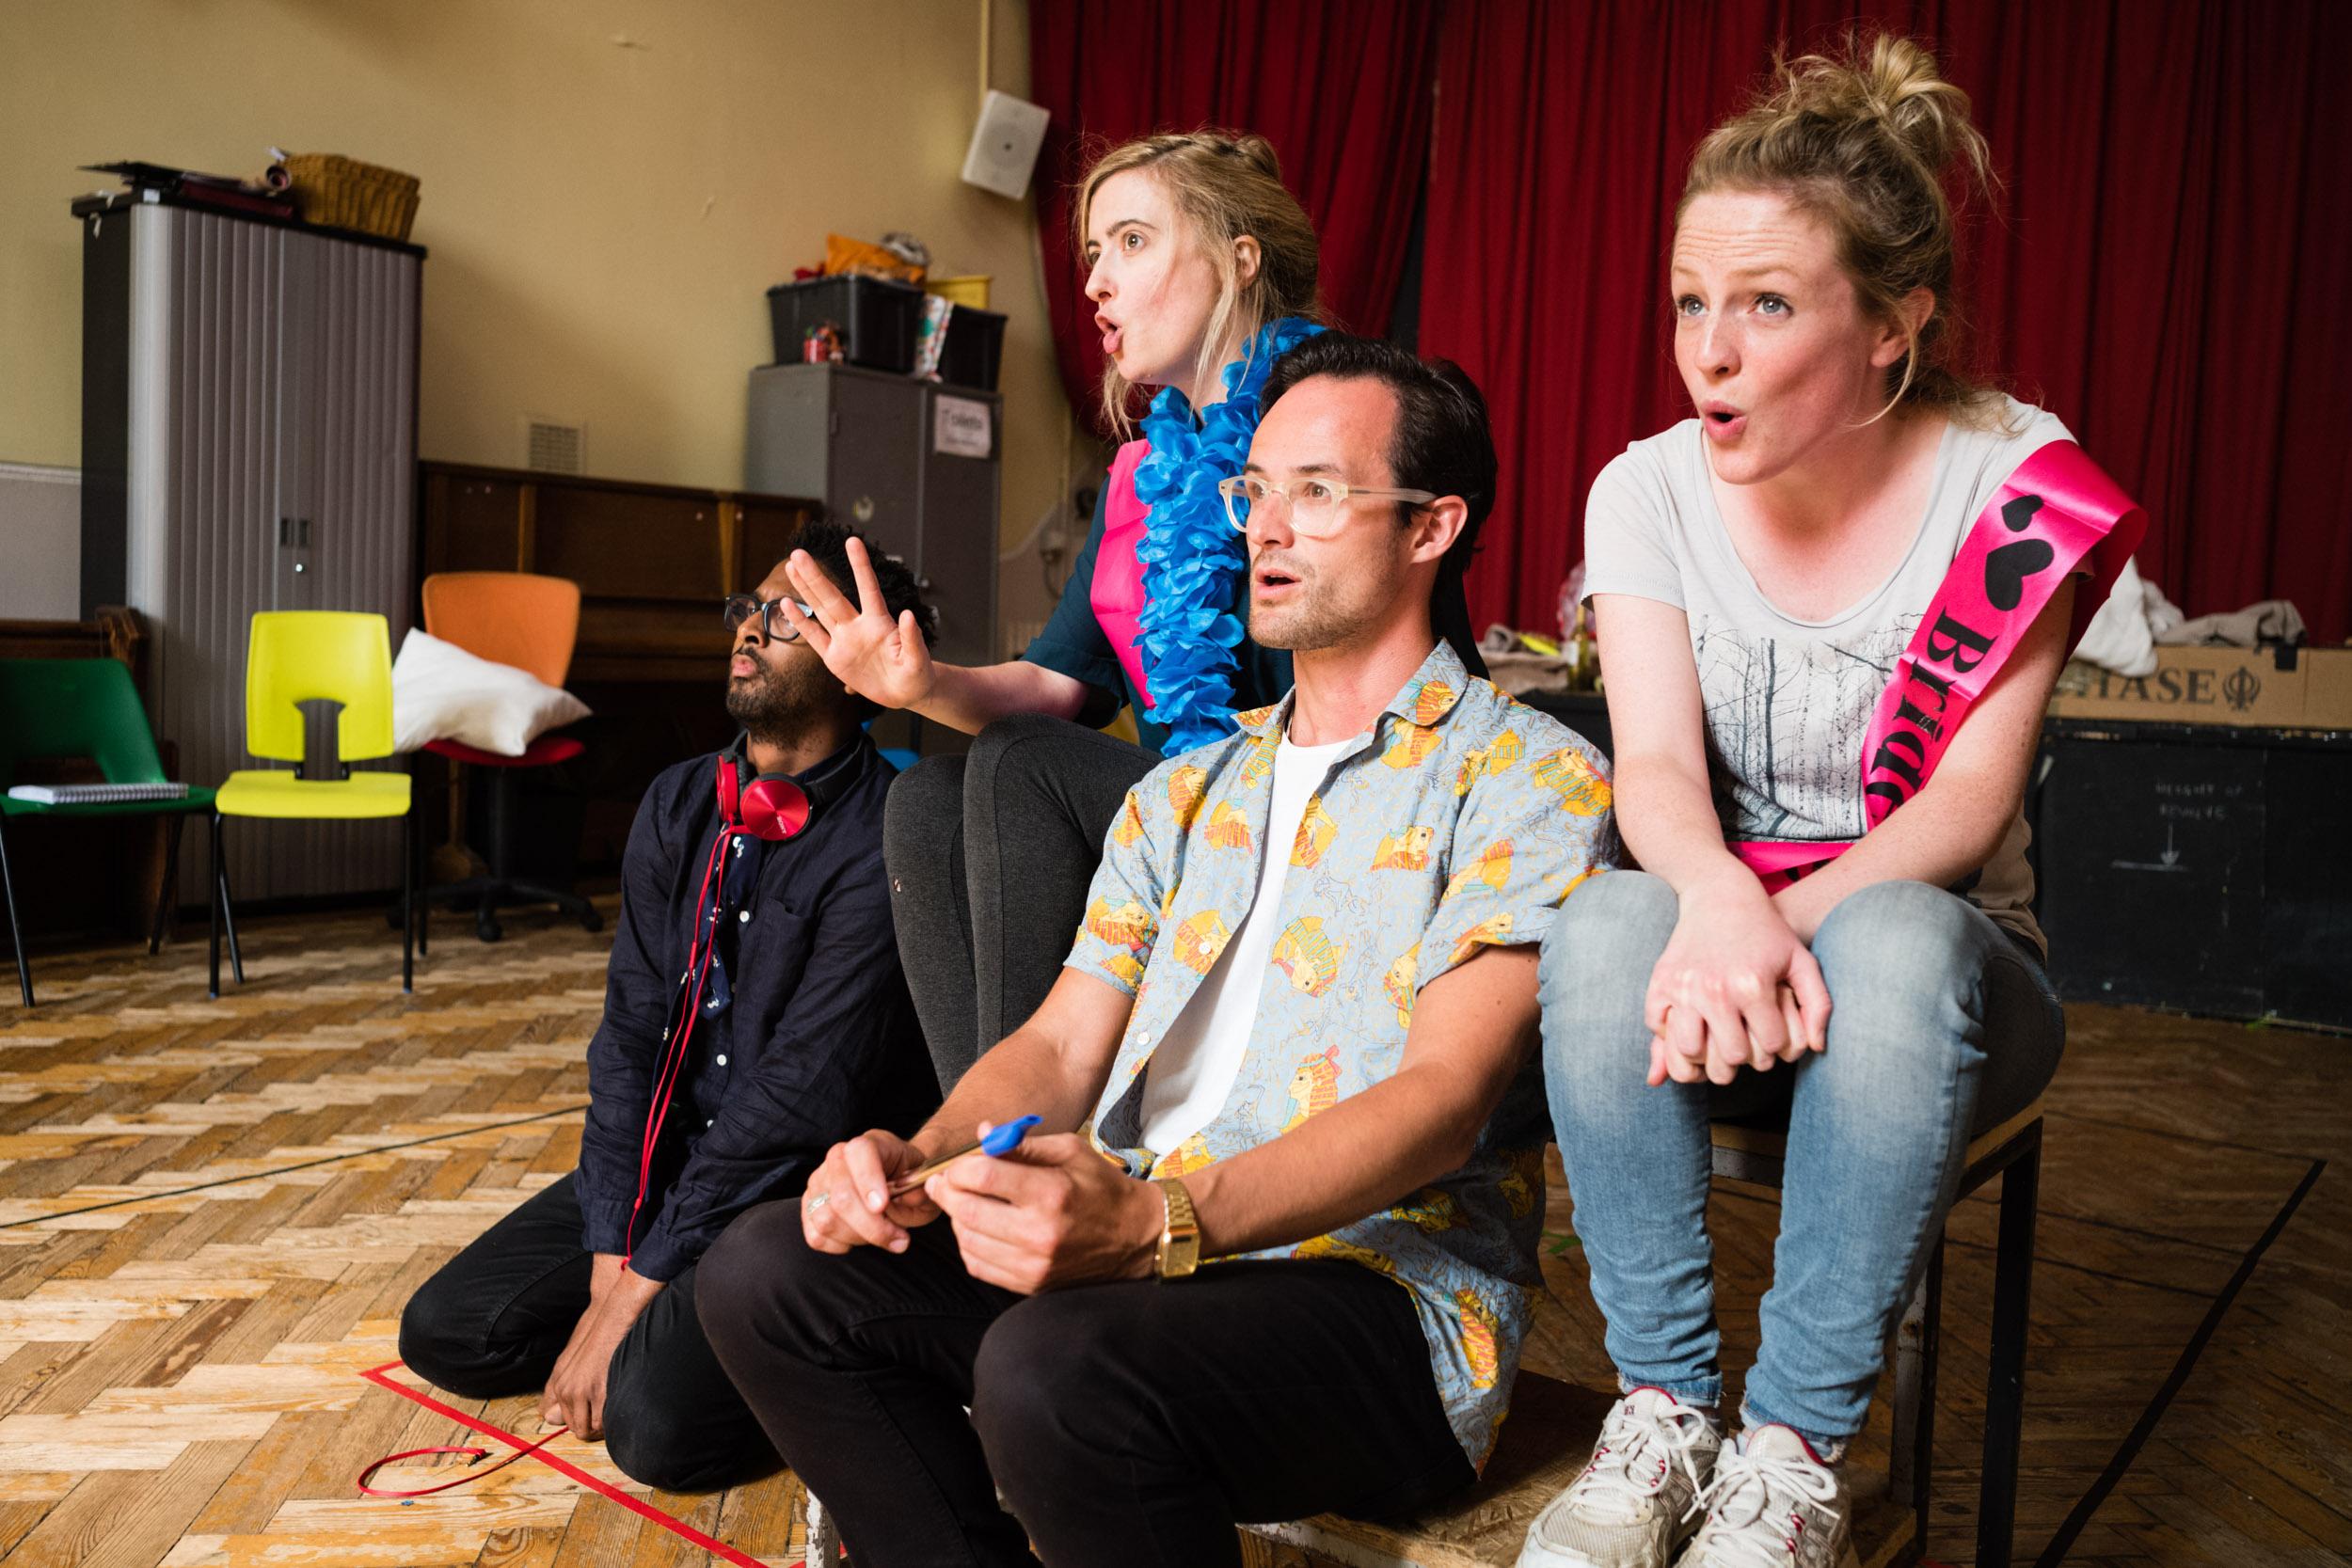 From Left: Abigail Kelly (Pamina), Rosie Middleton (Papagena), Lawrence Olsworth-Peter (Tamino), Susanna Buckle (Pamina)